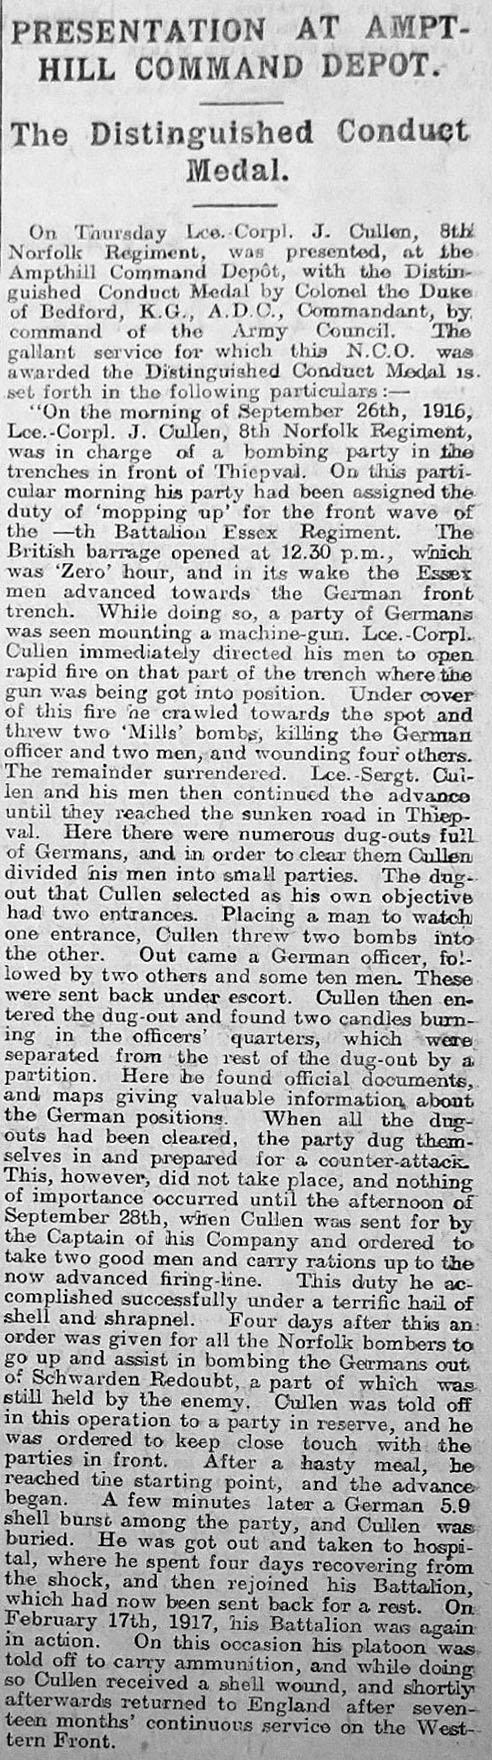 Bedfordshire Standard - August 10, 1917